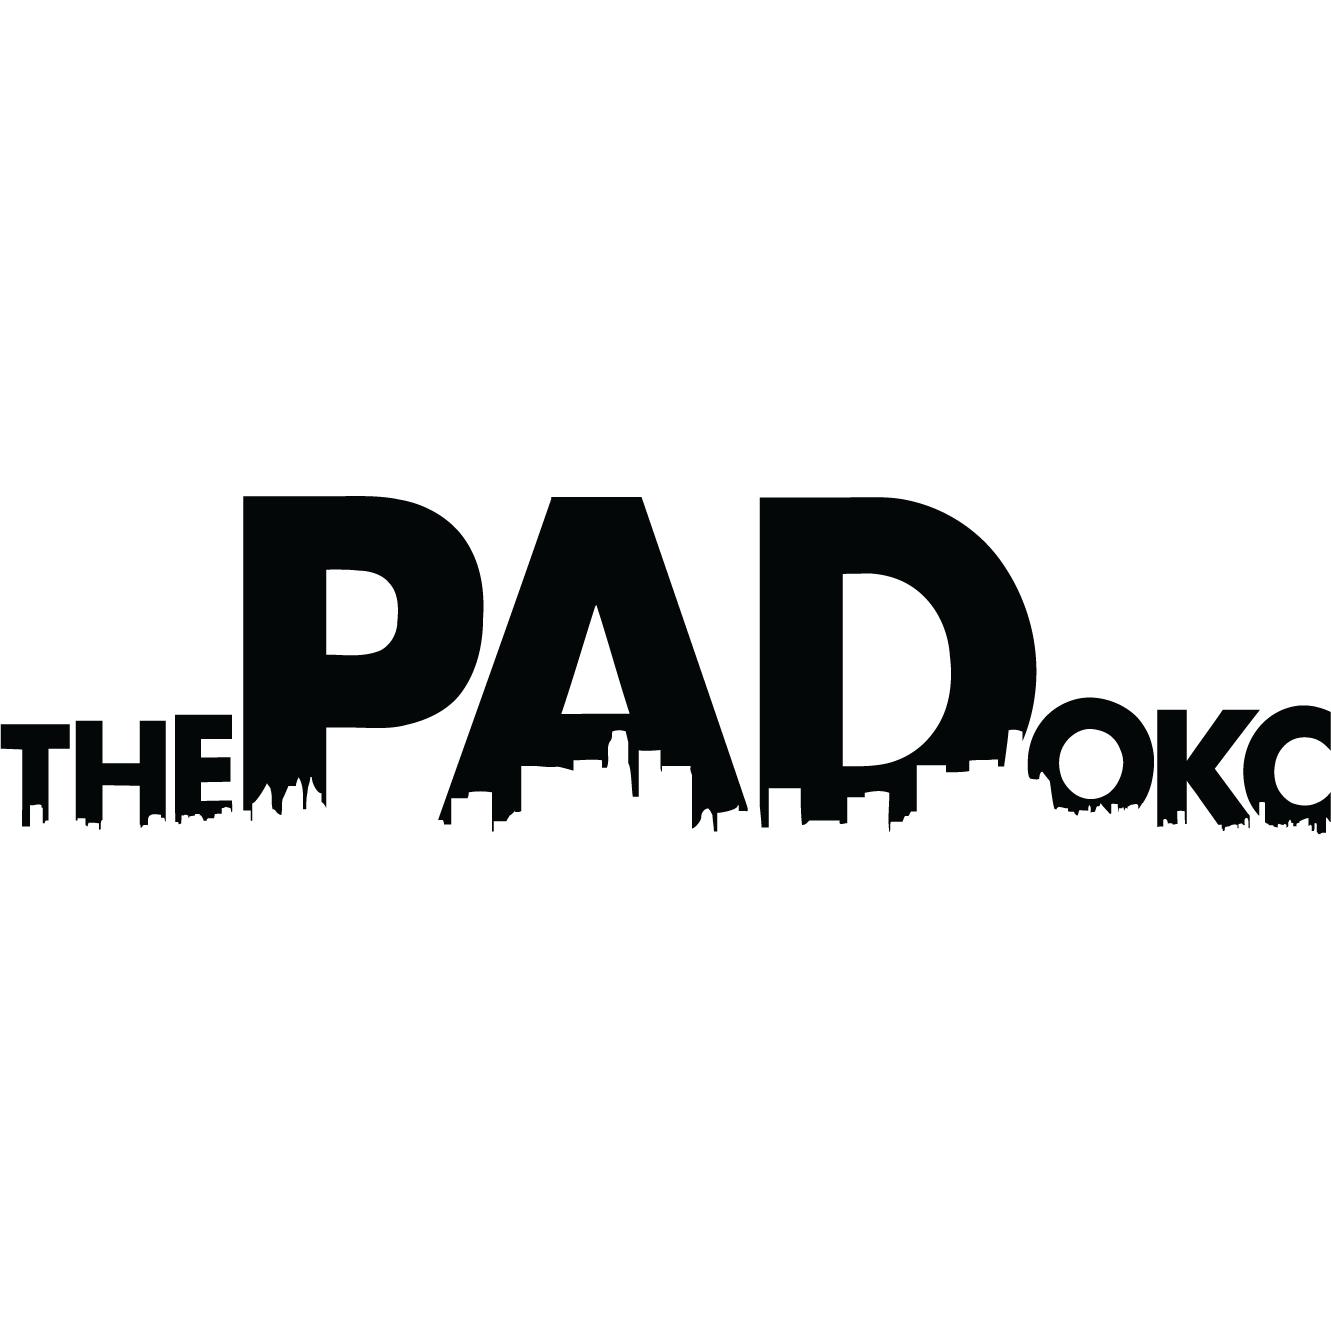 The PAD okc image 7